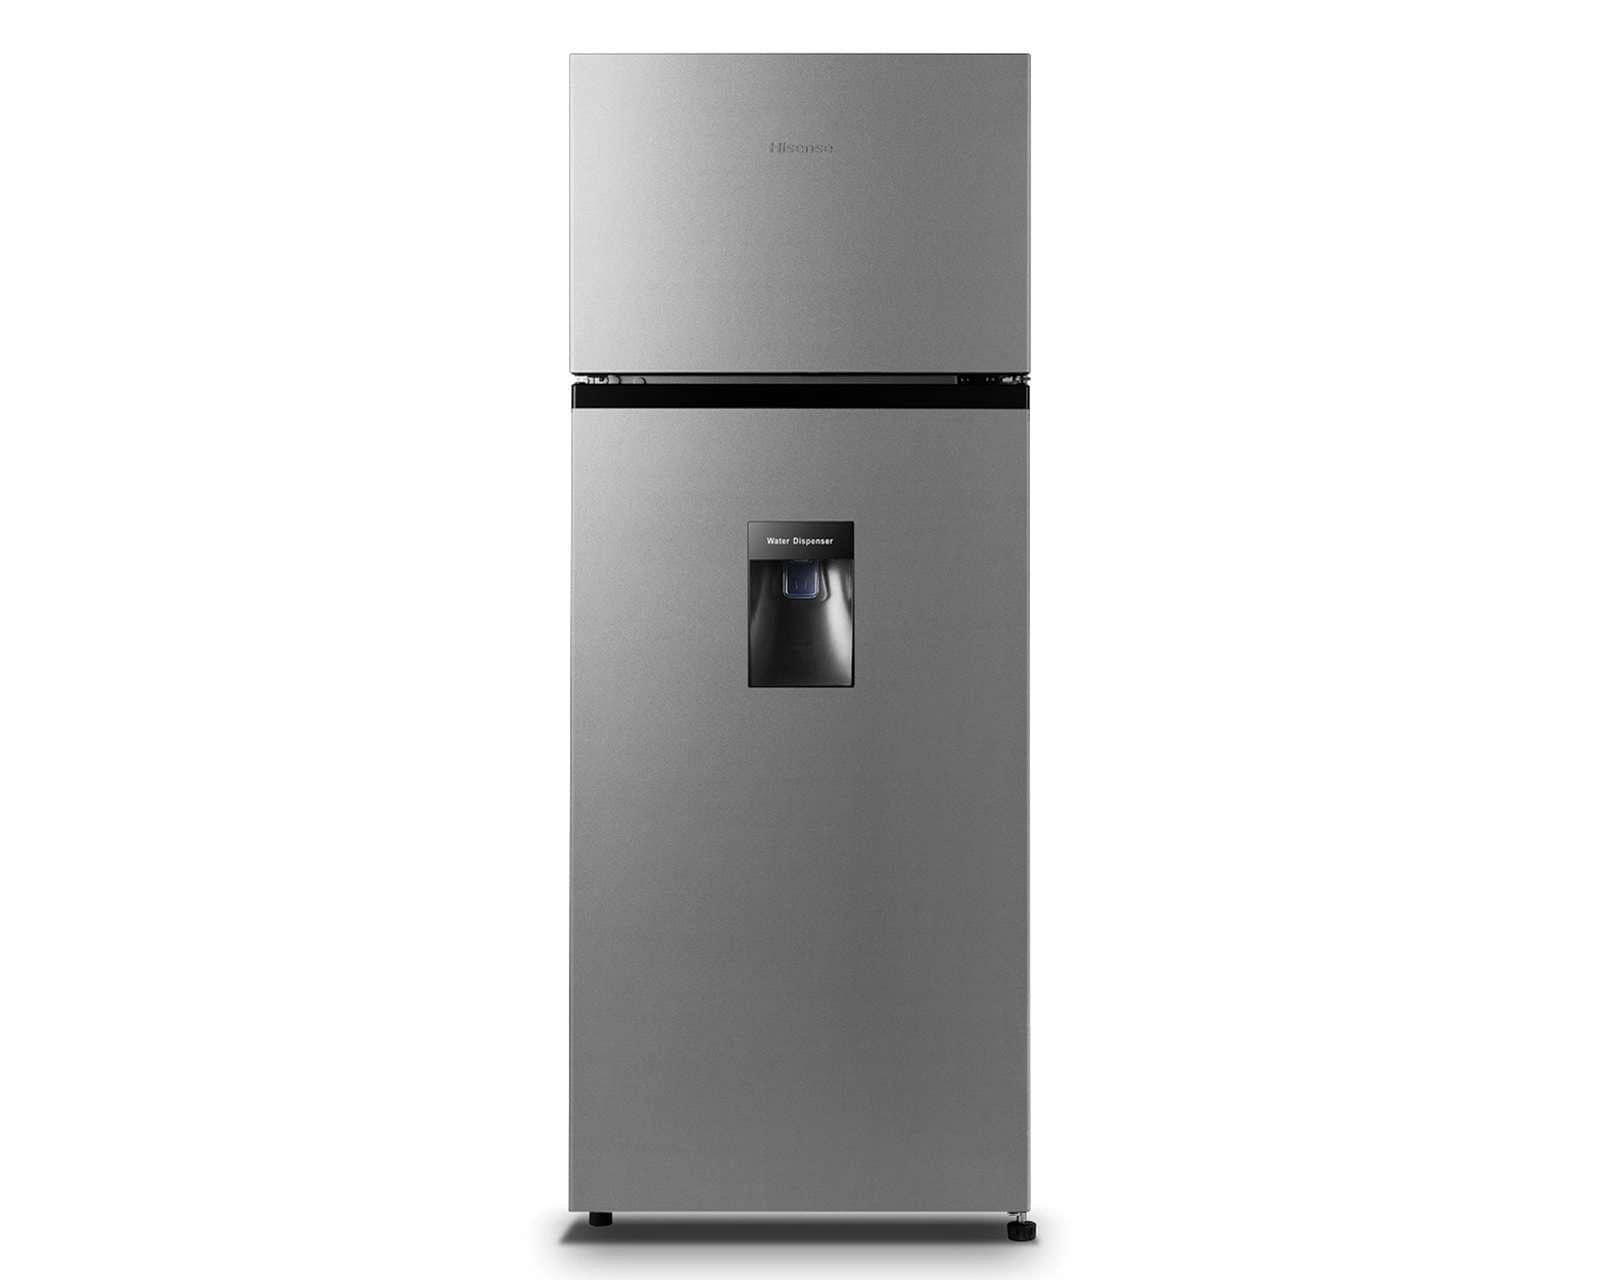 Refrigerador Hisense Top Mount 8 Pies Silver RT80D6WGX